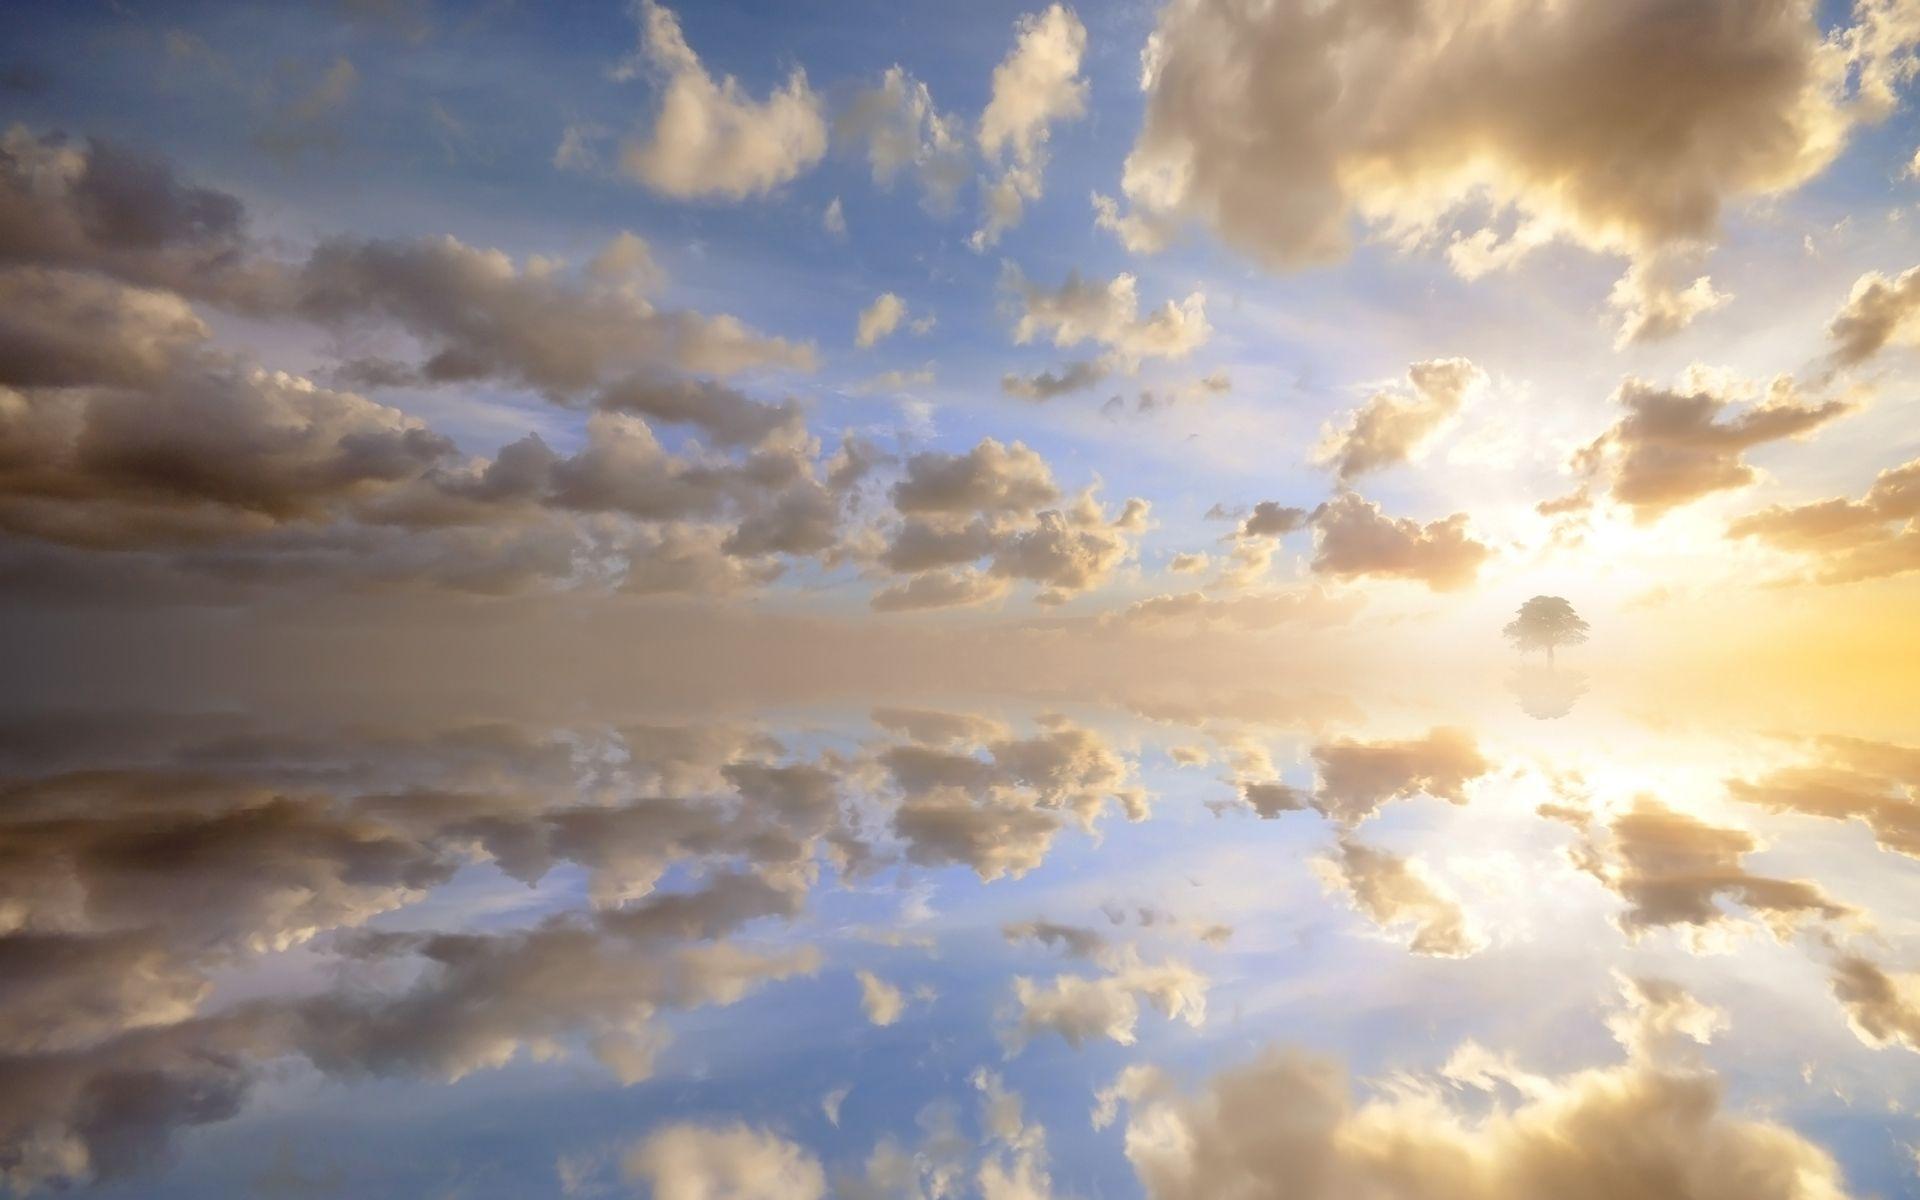 heaven backgrounds screensavers wallpaper - photo #1